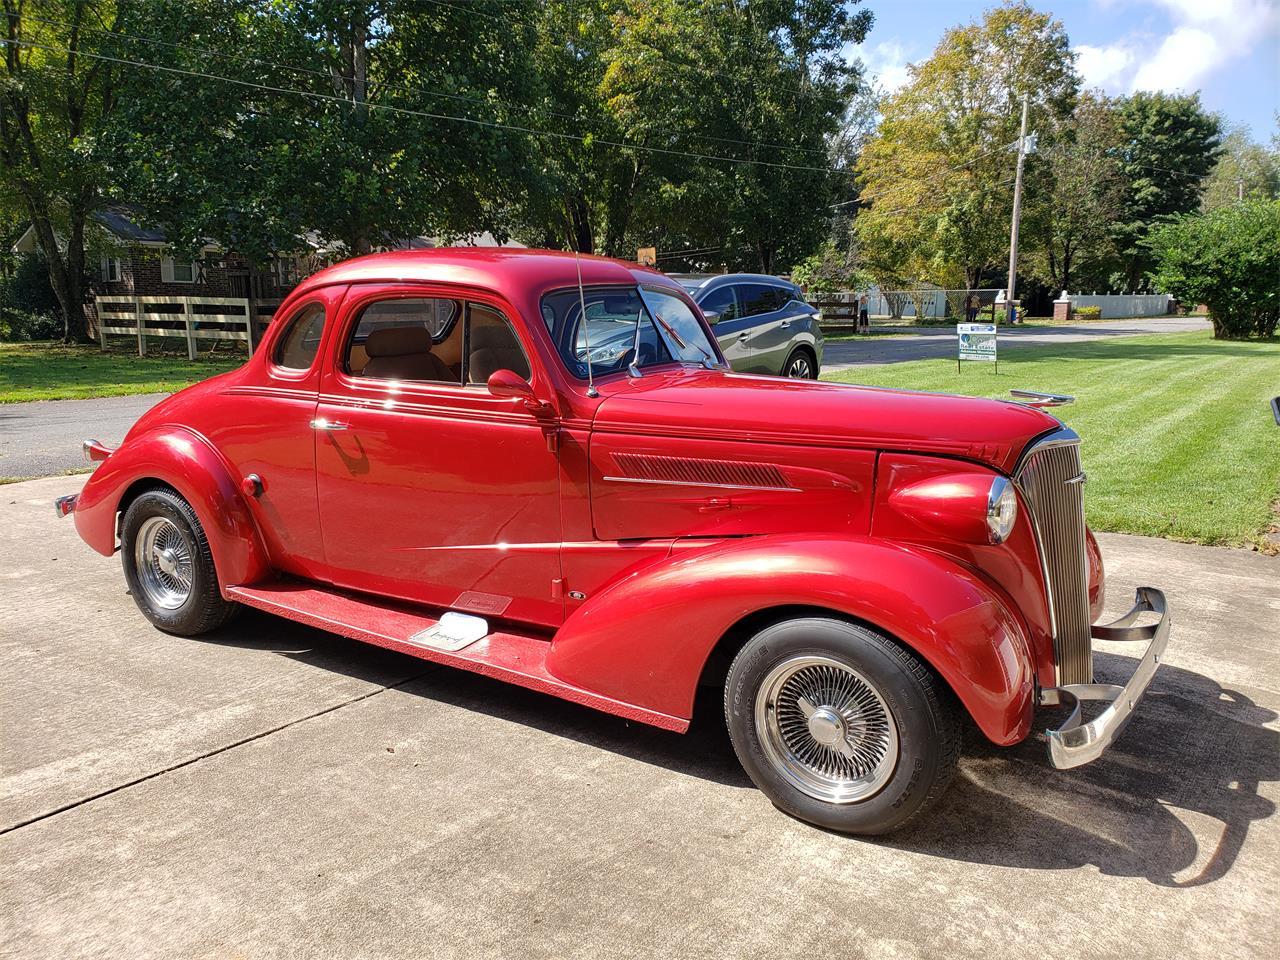 Chevrolet Dealers In Arkansas >> 1937 Chevrolet Coupe for Sale | ClassicCars.com | CC-1266055